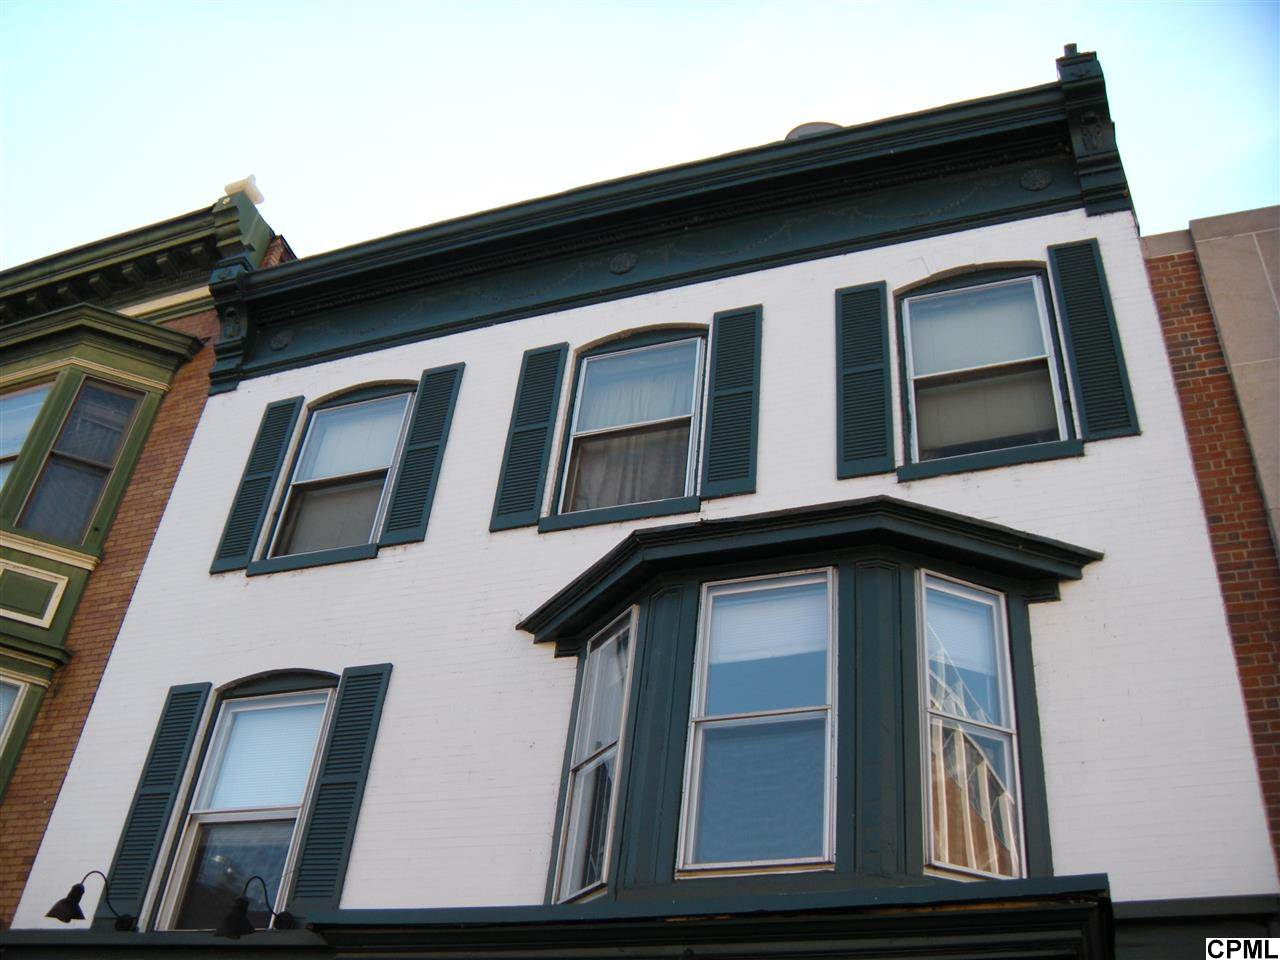 Rental Homes for Rent, ListingId:30610616, location: 226 N 2nd St Harrisburg 17101